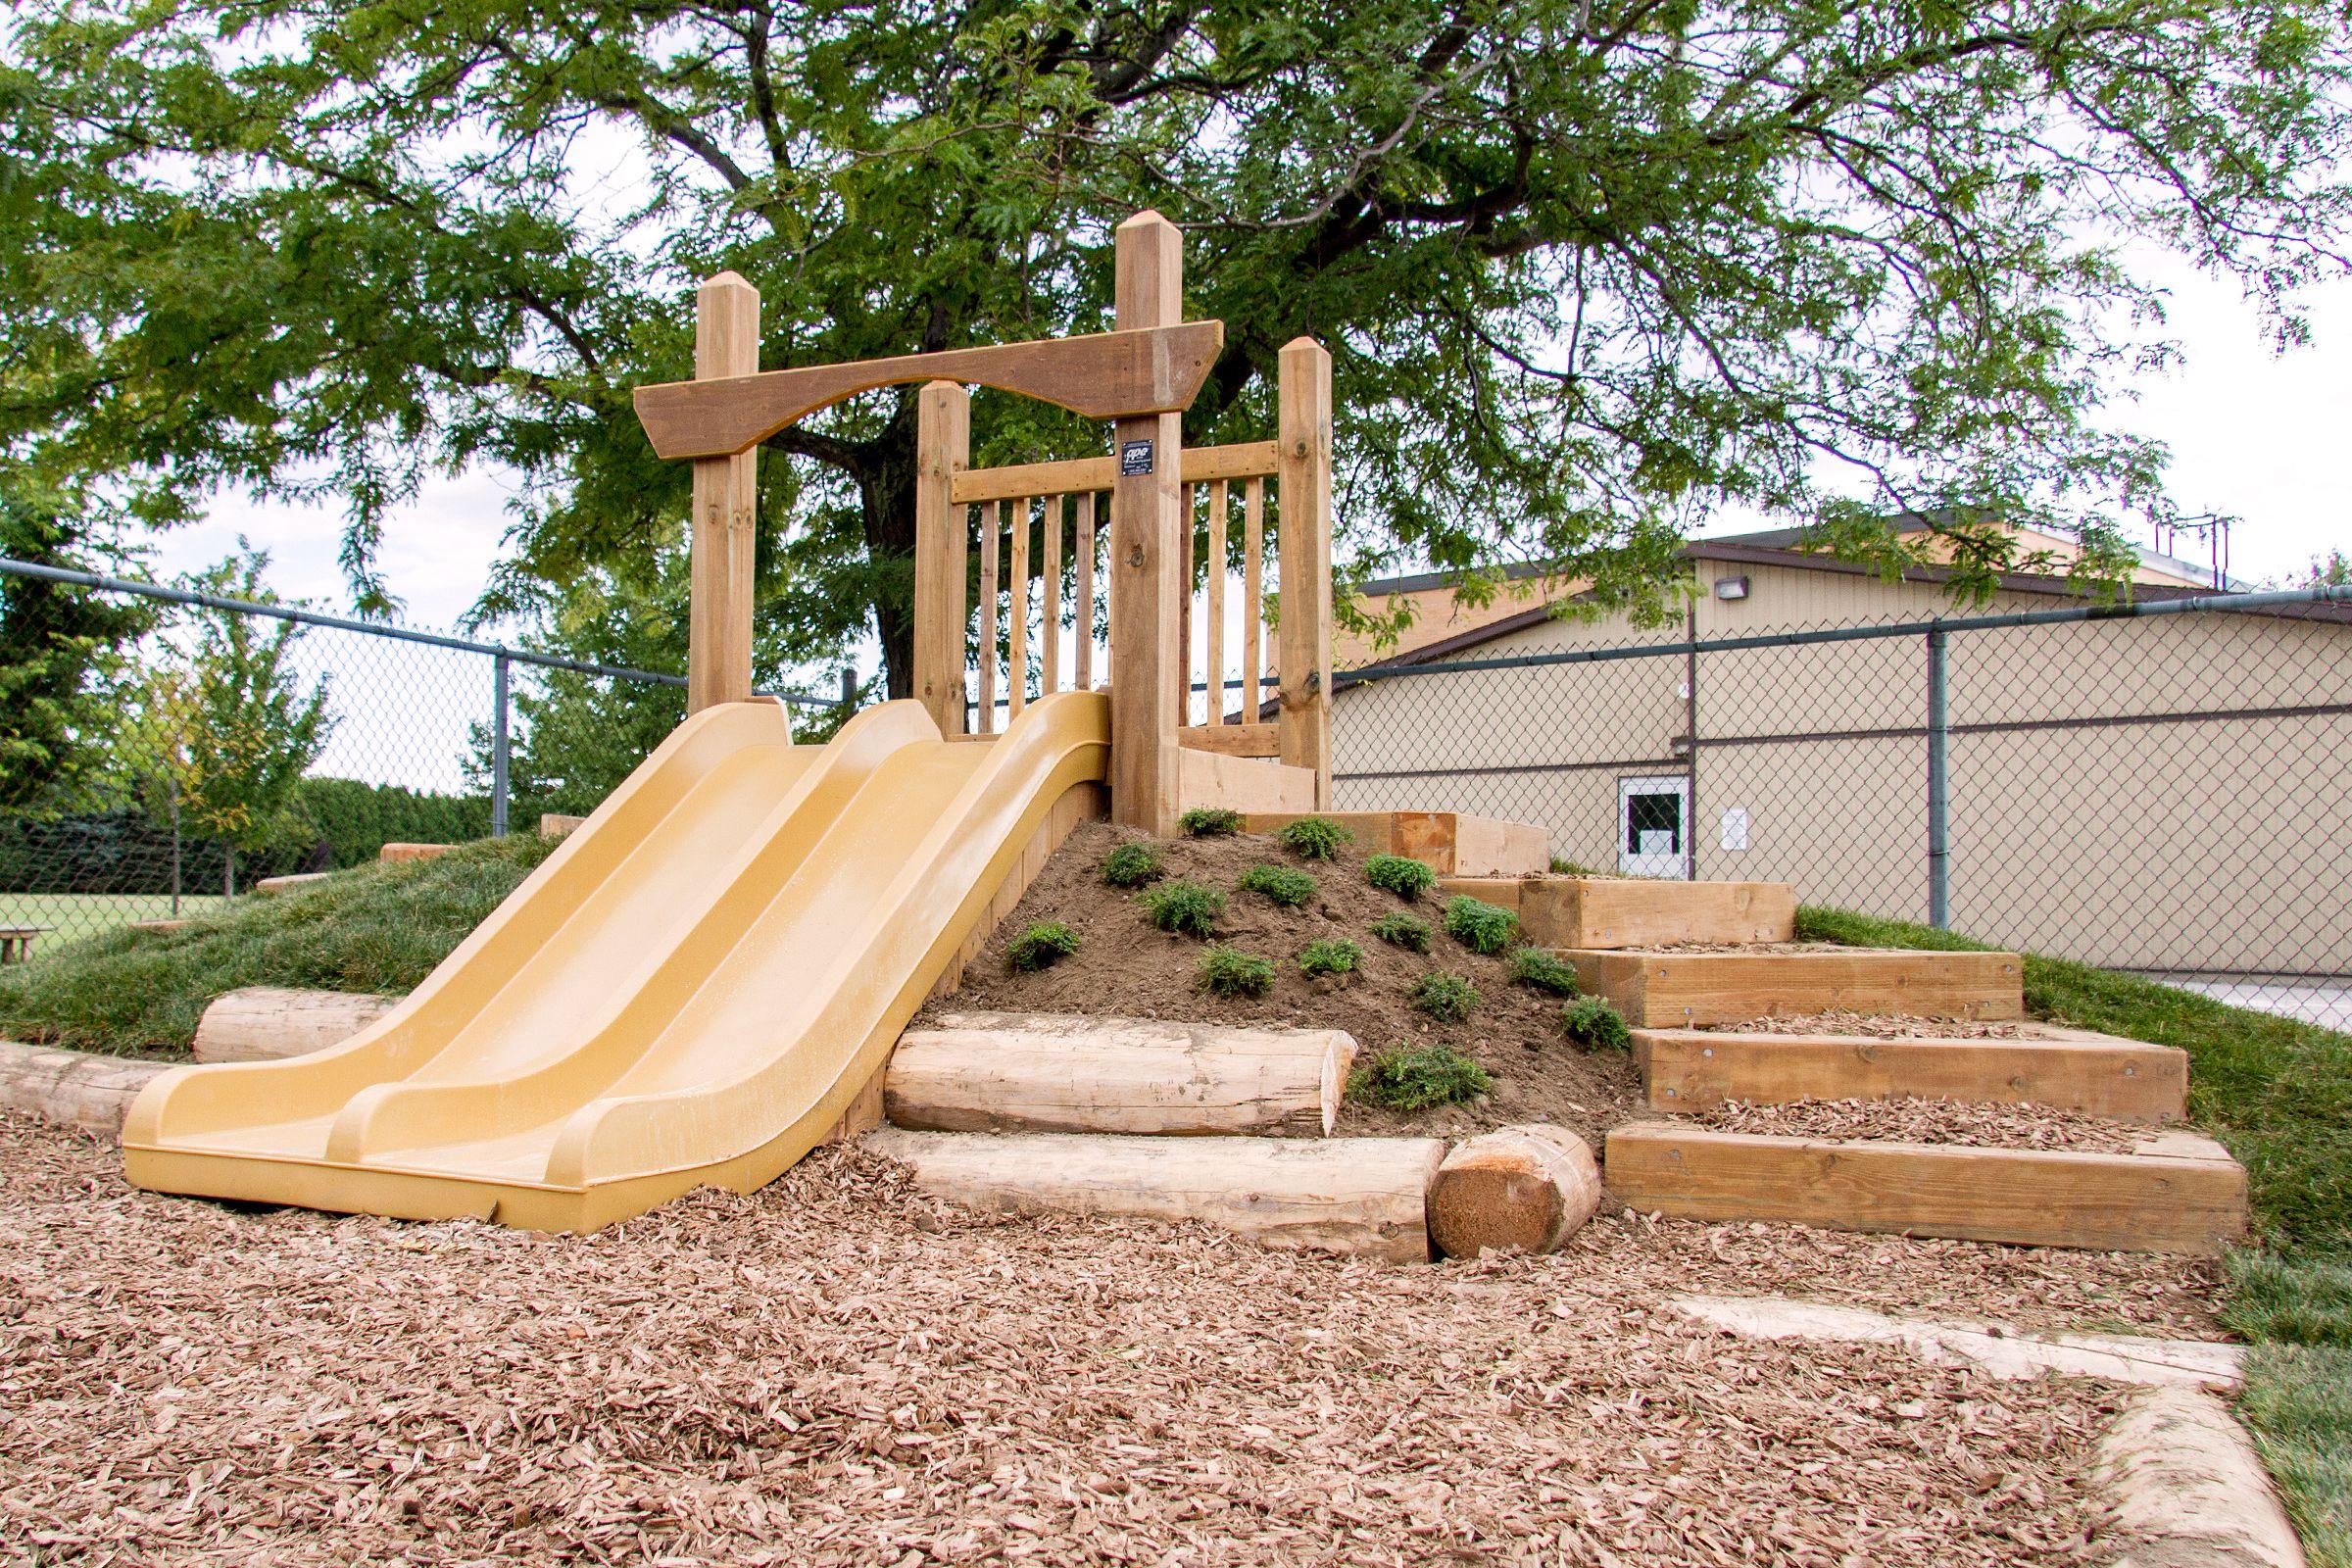 Natural Playgrounds - Active Playground Equipment Inc ...